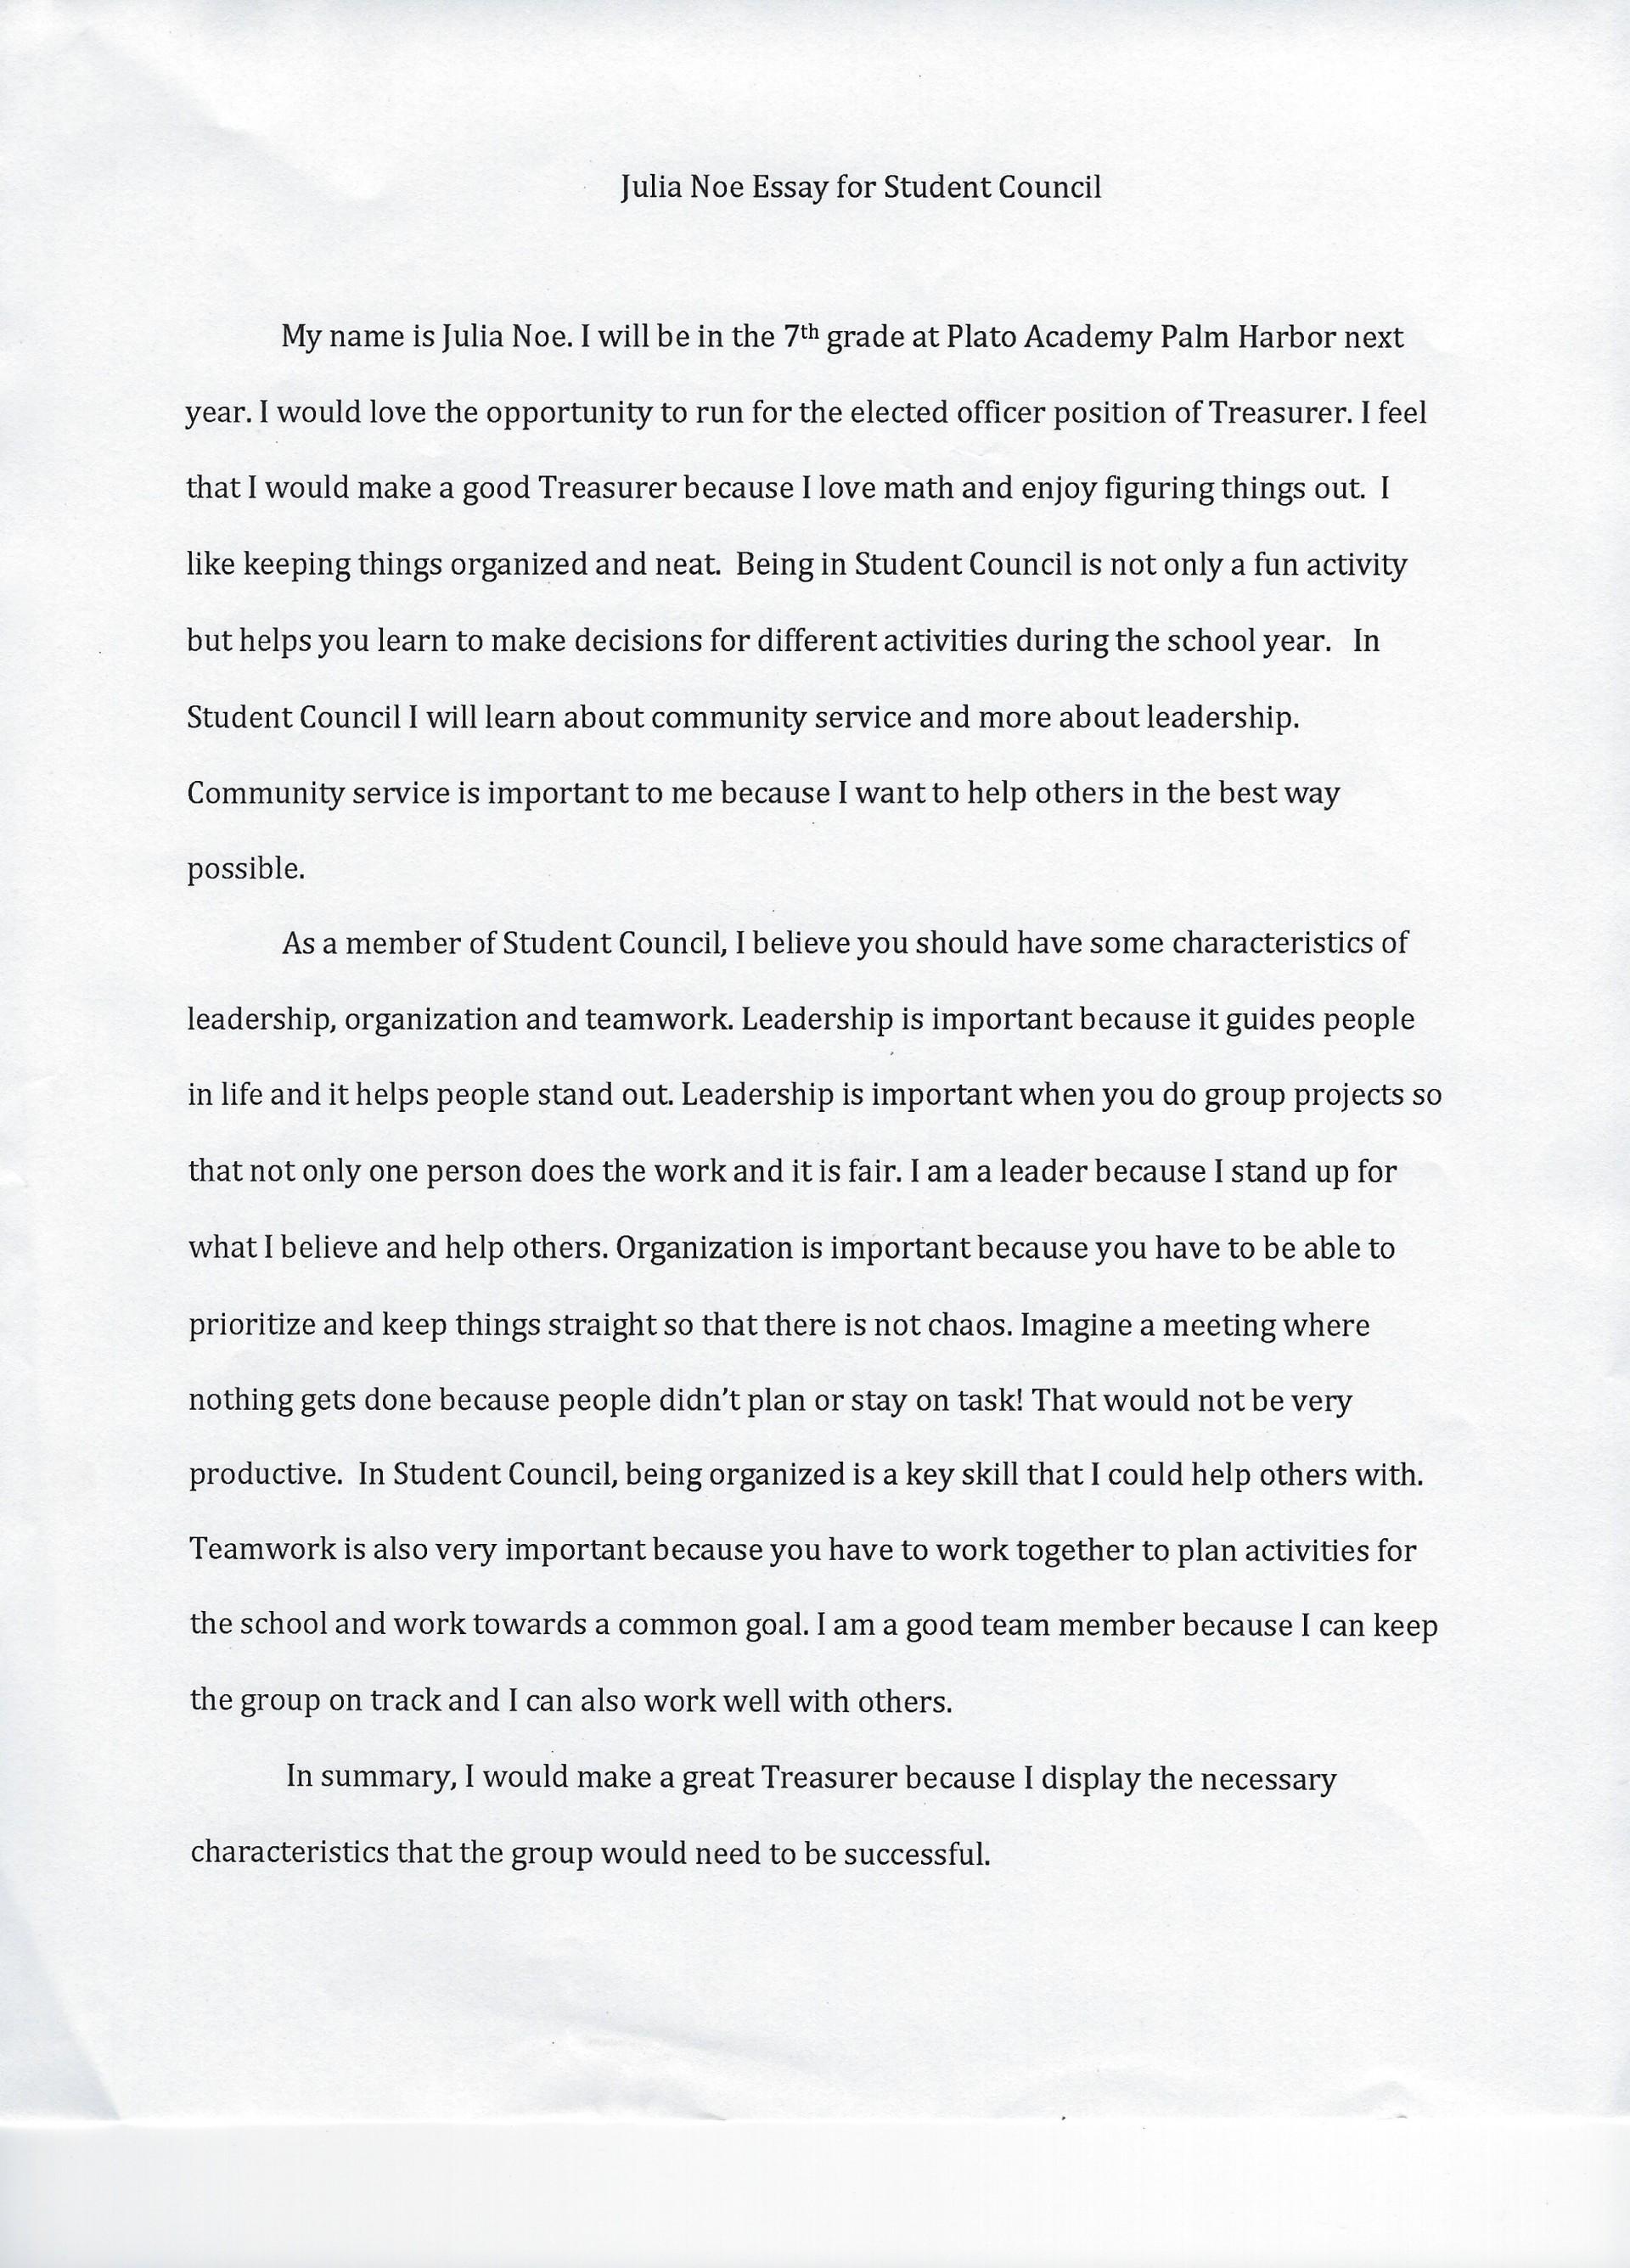 009 Student Council Essay Example Treasurer Noe Phenomenal Rubric Topics For Elementary 1920